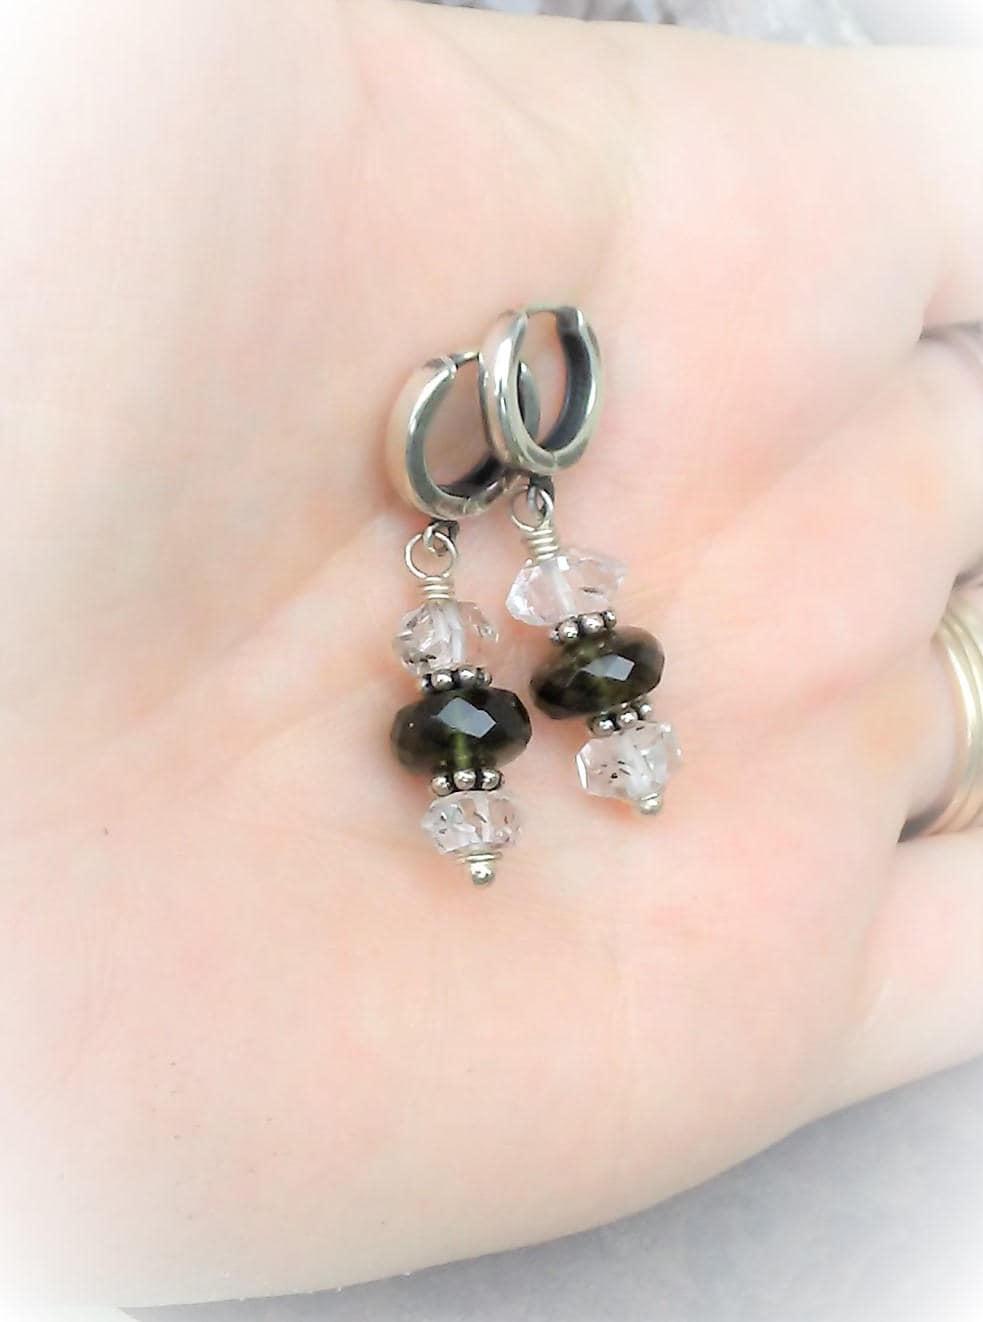 5dee9d27b6bec Moldavite And Herkimer Diamond Earrings-Moldavite Jewelry-Herkimer Diamond  Jewelry-Sterling Silver-Healing Jewelry-Rare Faceted Moldavite